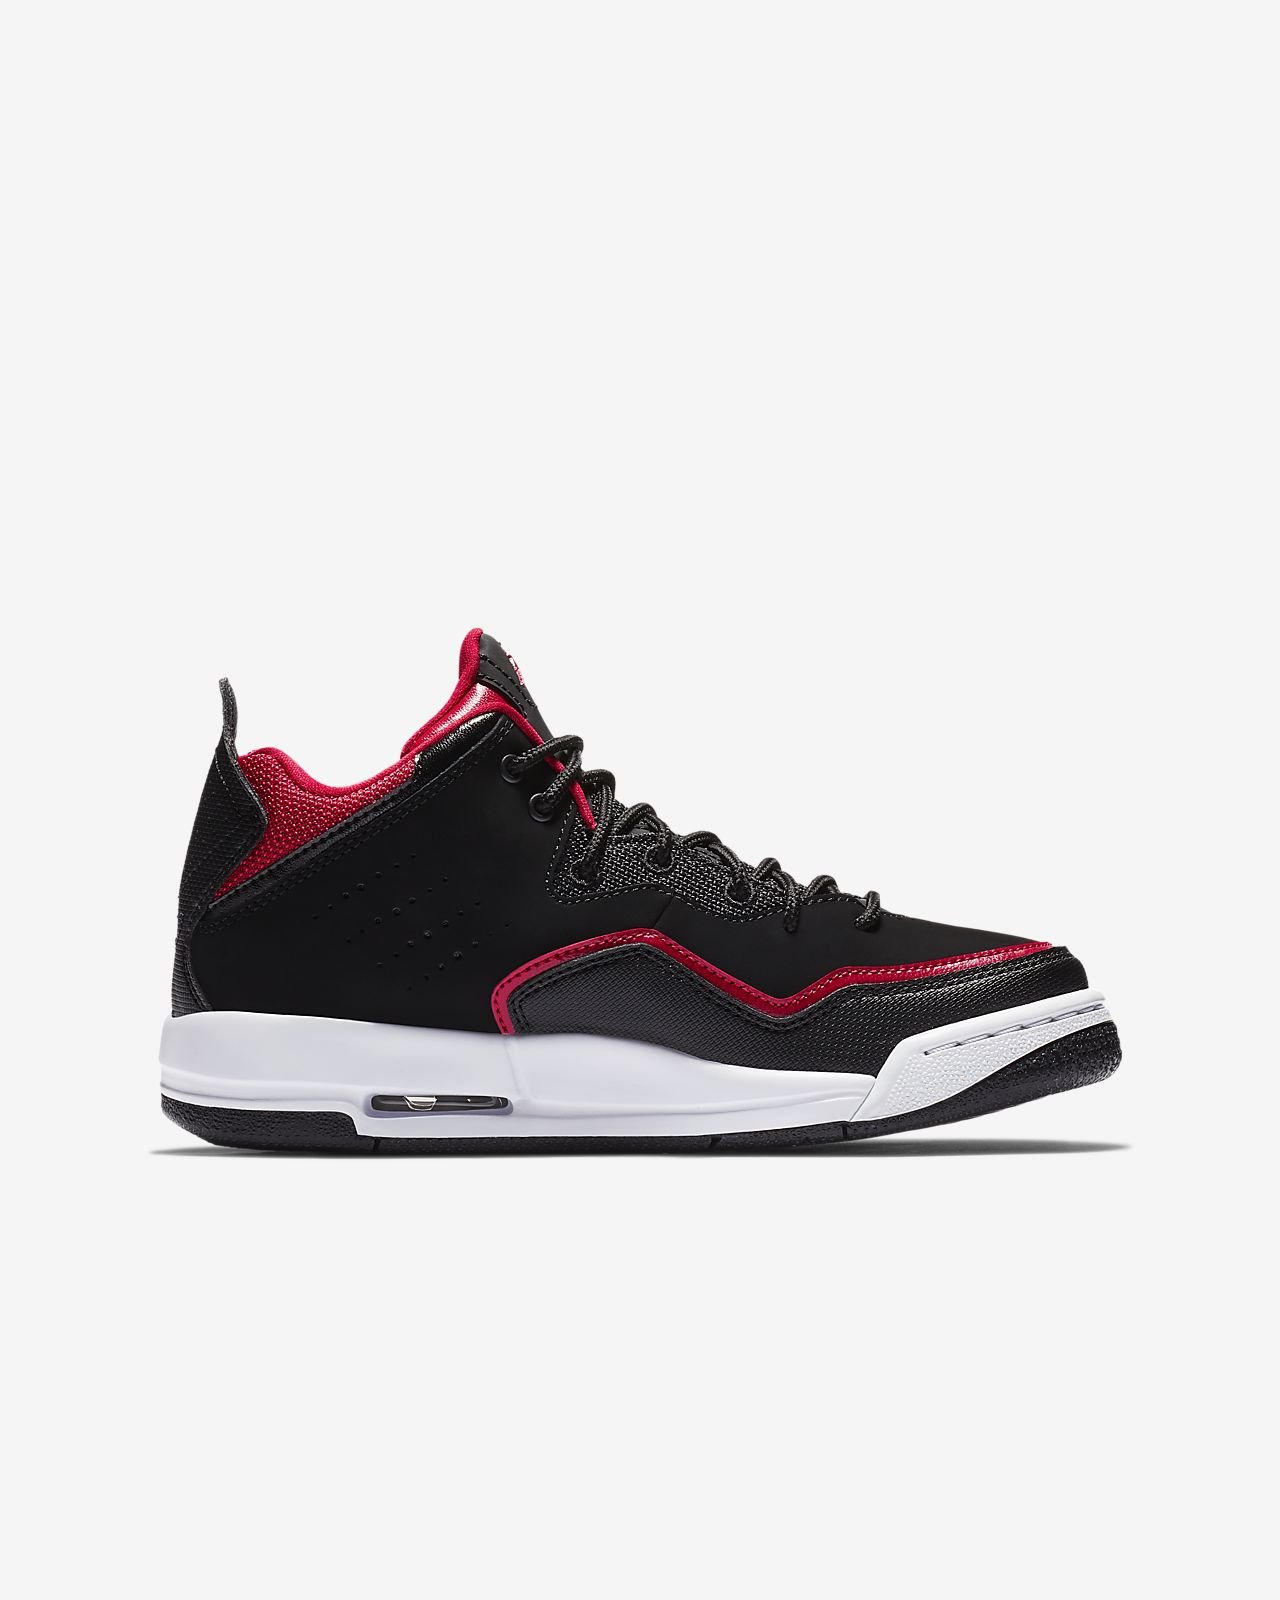 best service 573a9 b63b7 ... Jordan Courtside 23 Schuh für ältere Kinder